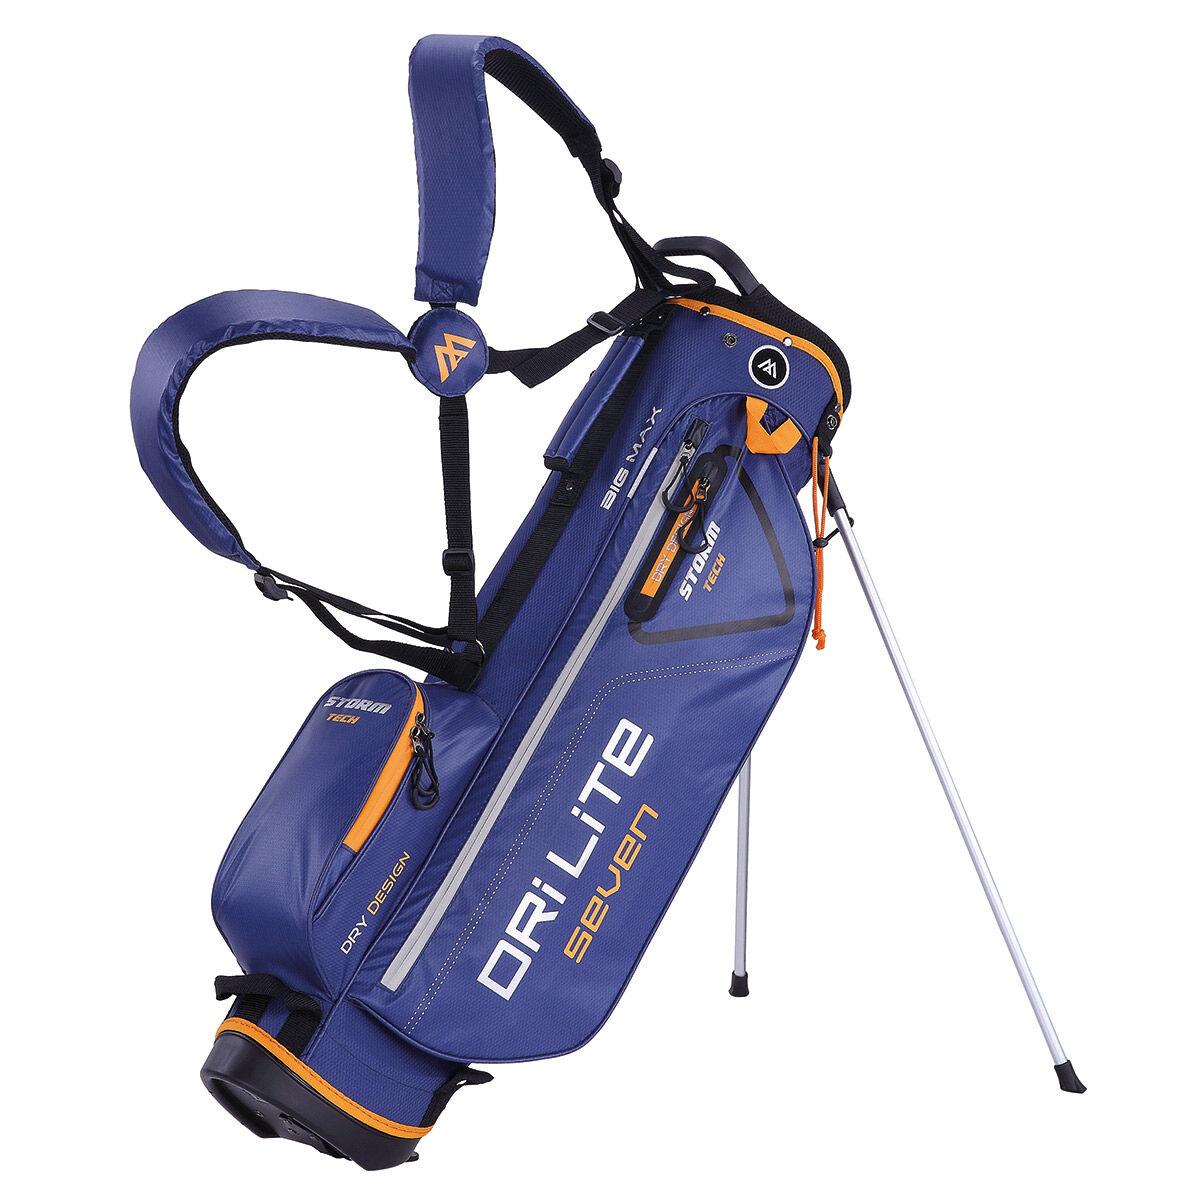 BIG MAX Dri Lite Seven Golf Stand Bag, Black red | American Golf